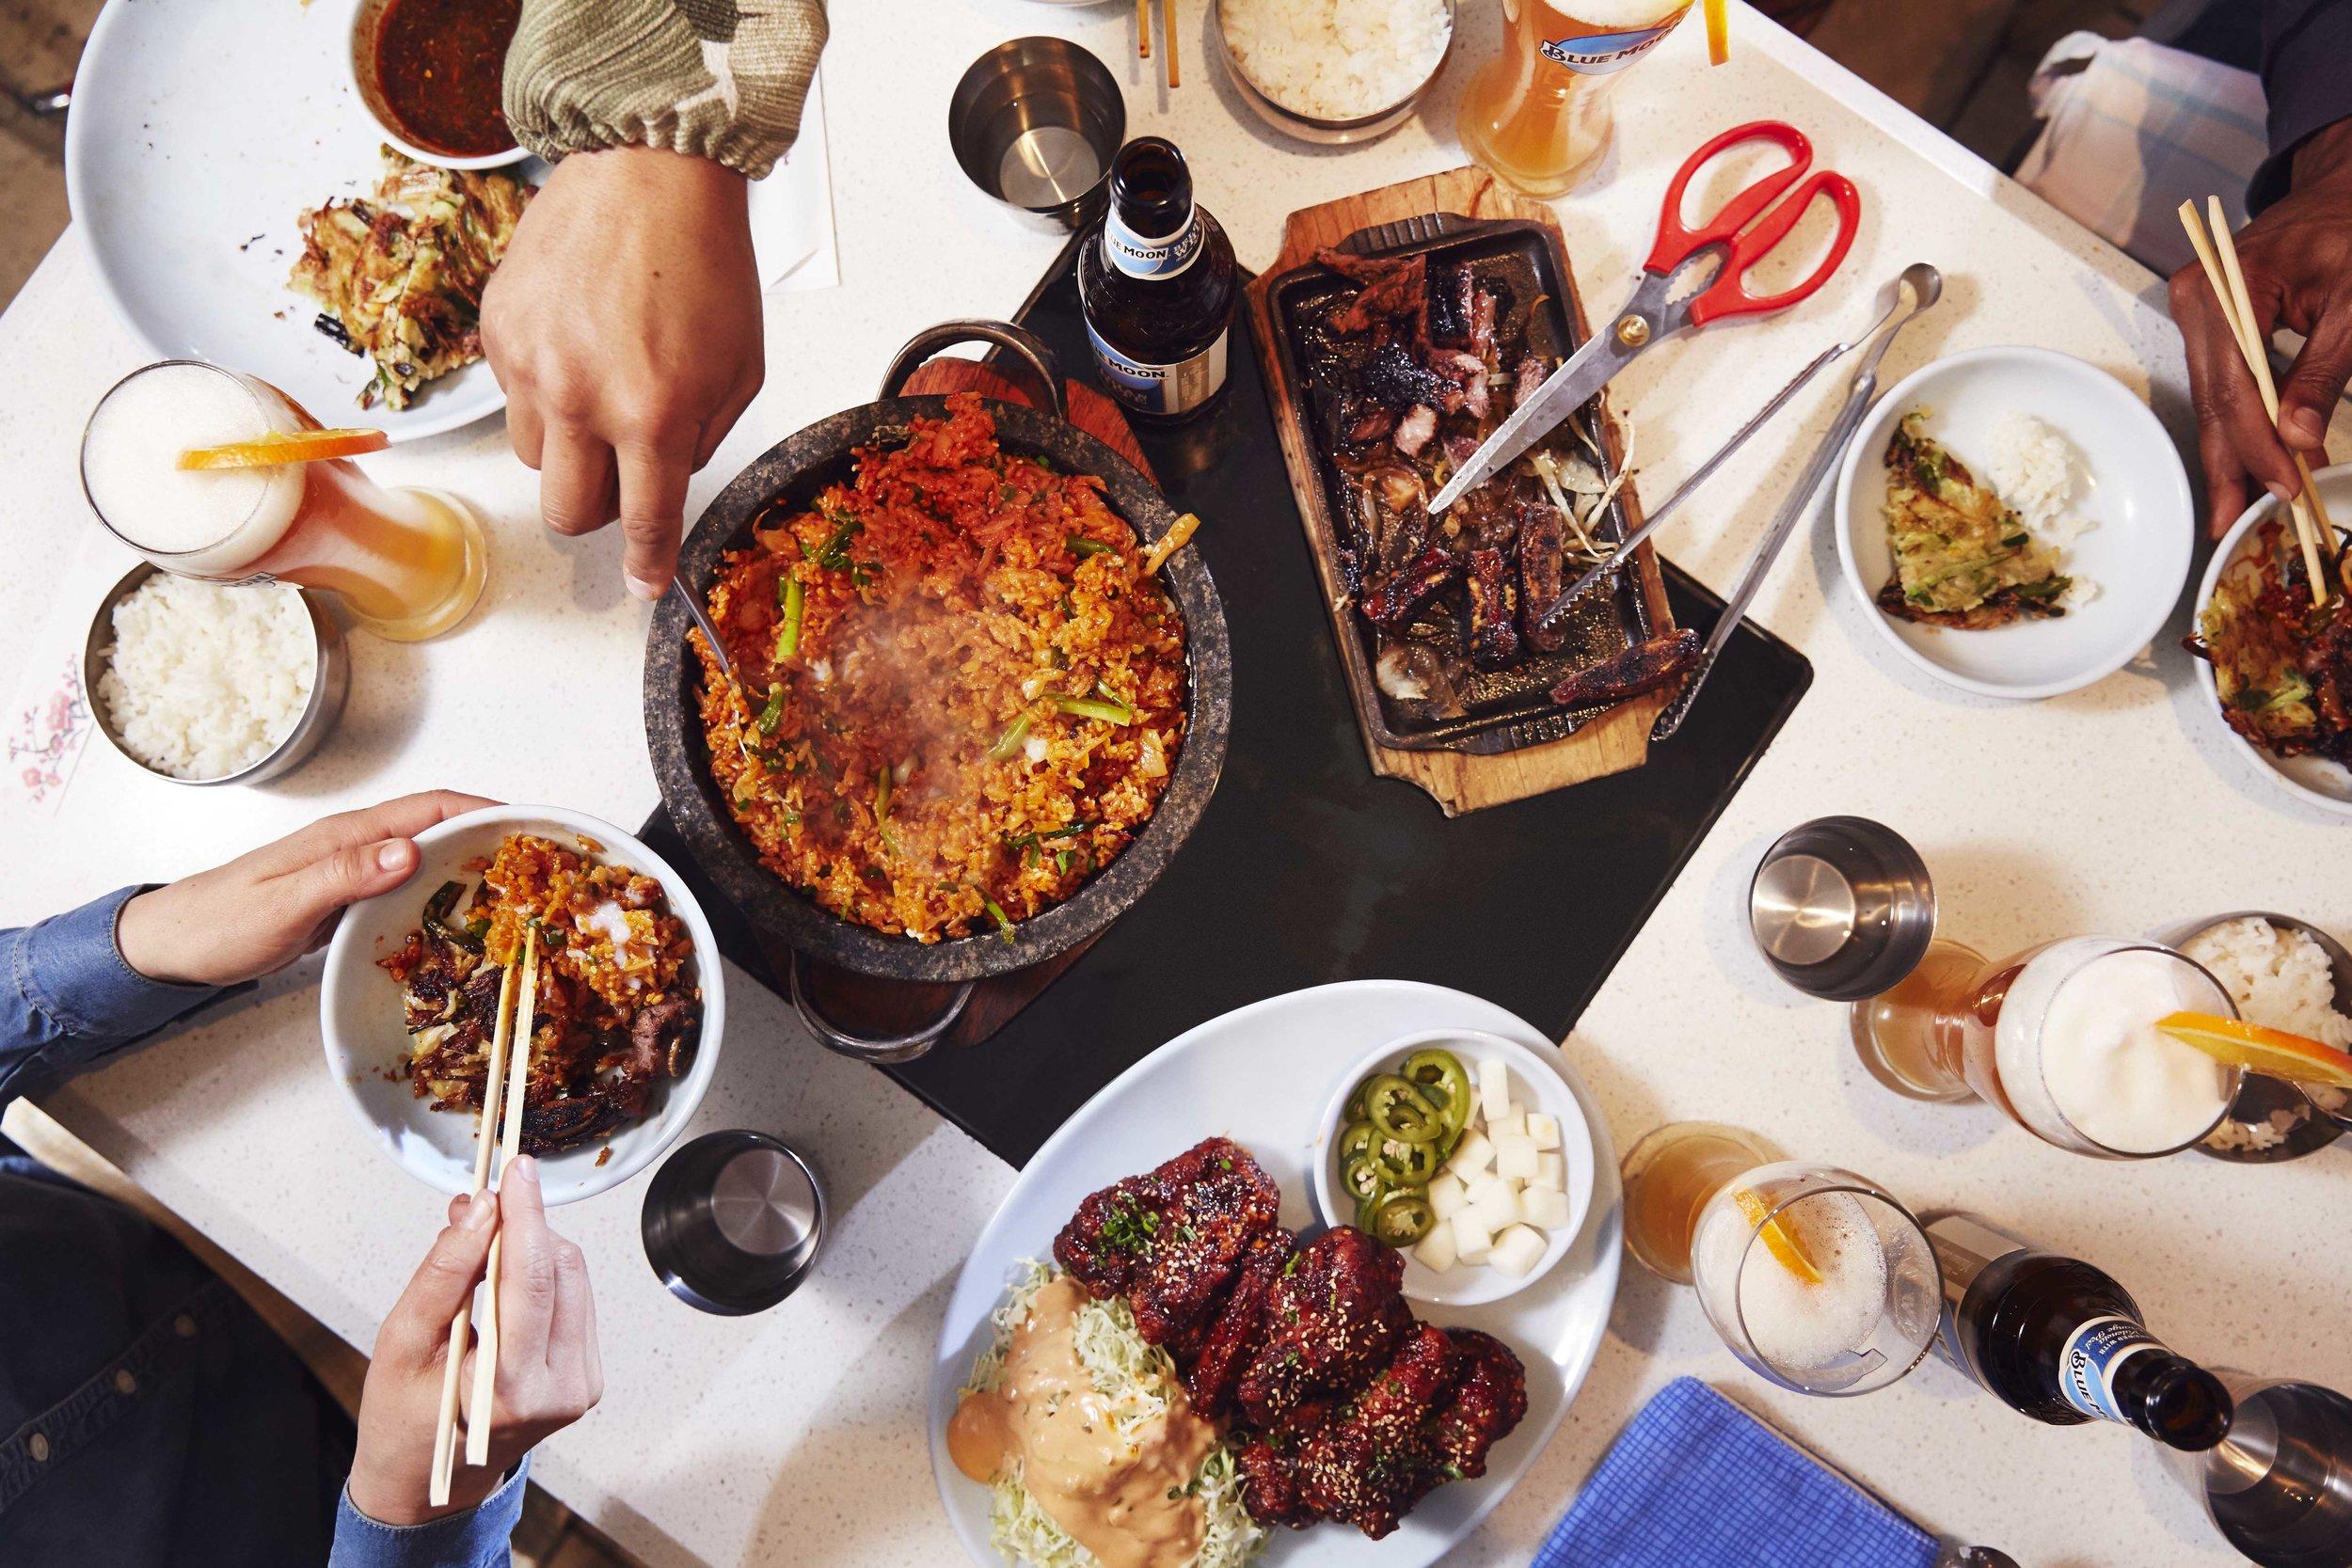 bluemoon-restaurant-5736.jpg